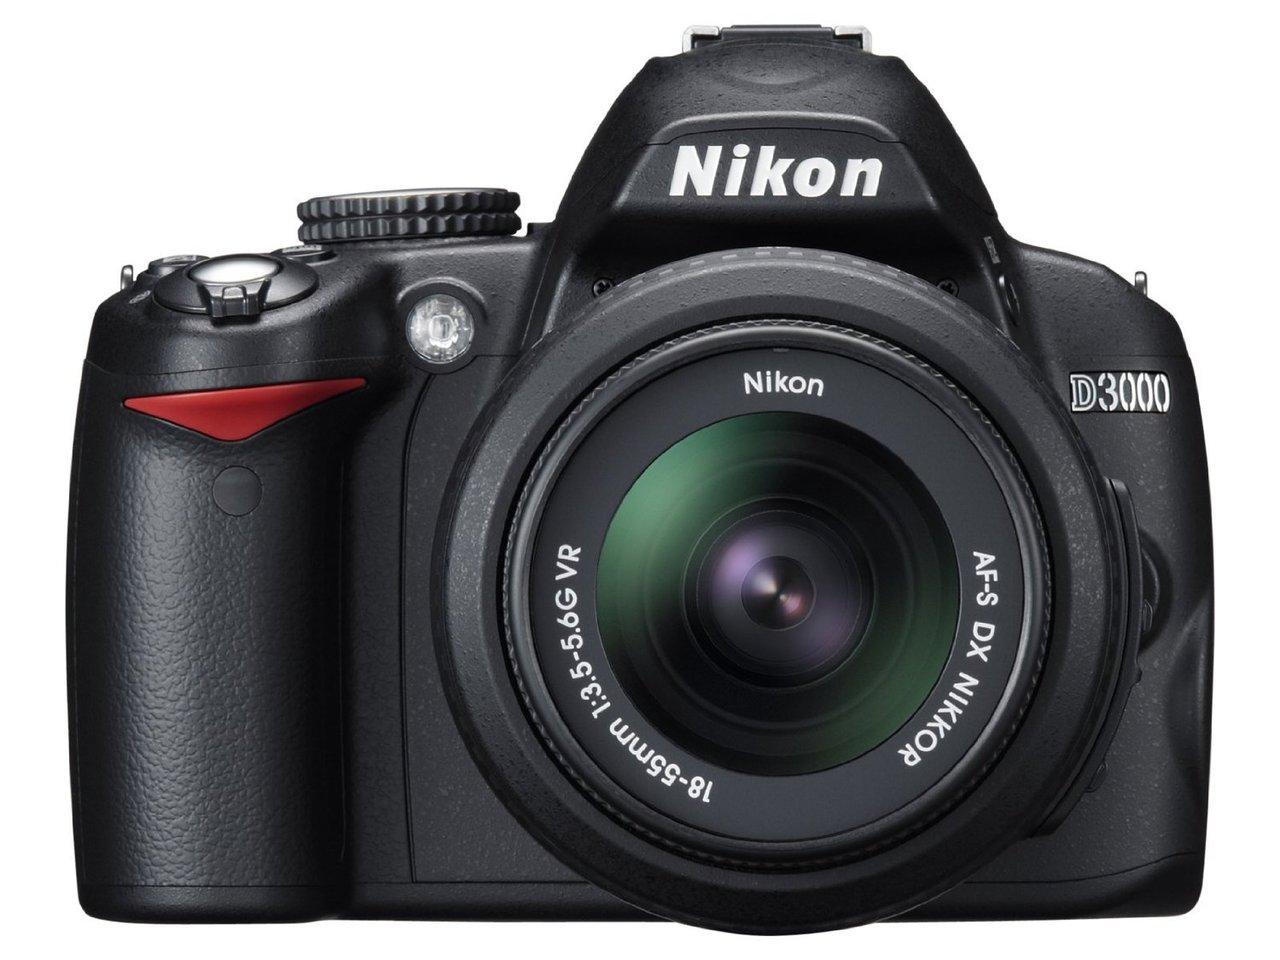 Nikon D3300 DSLR  1855mm VR II Lens  Black